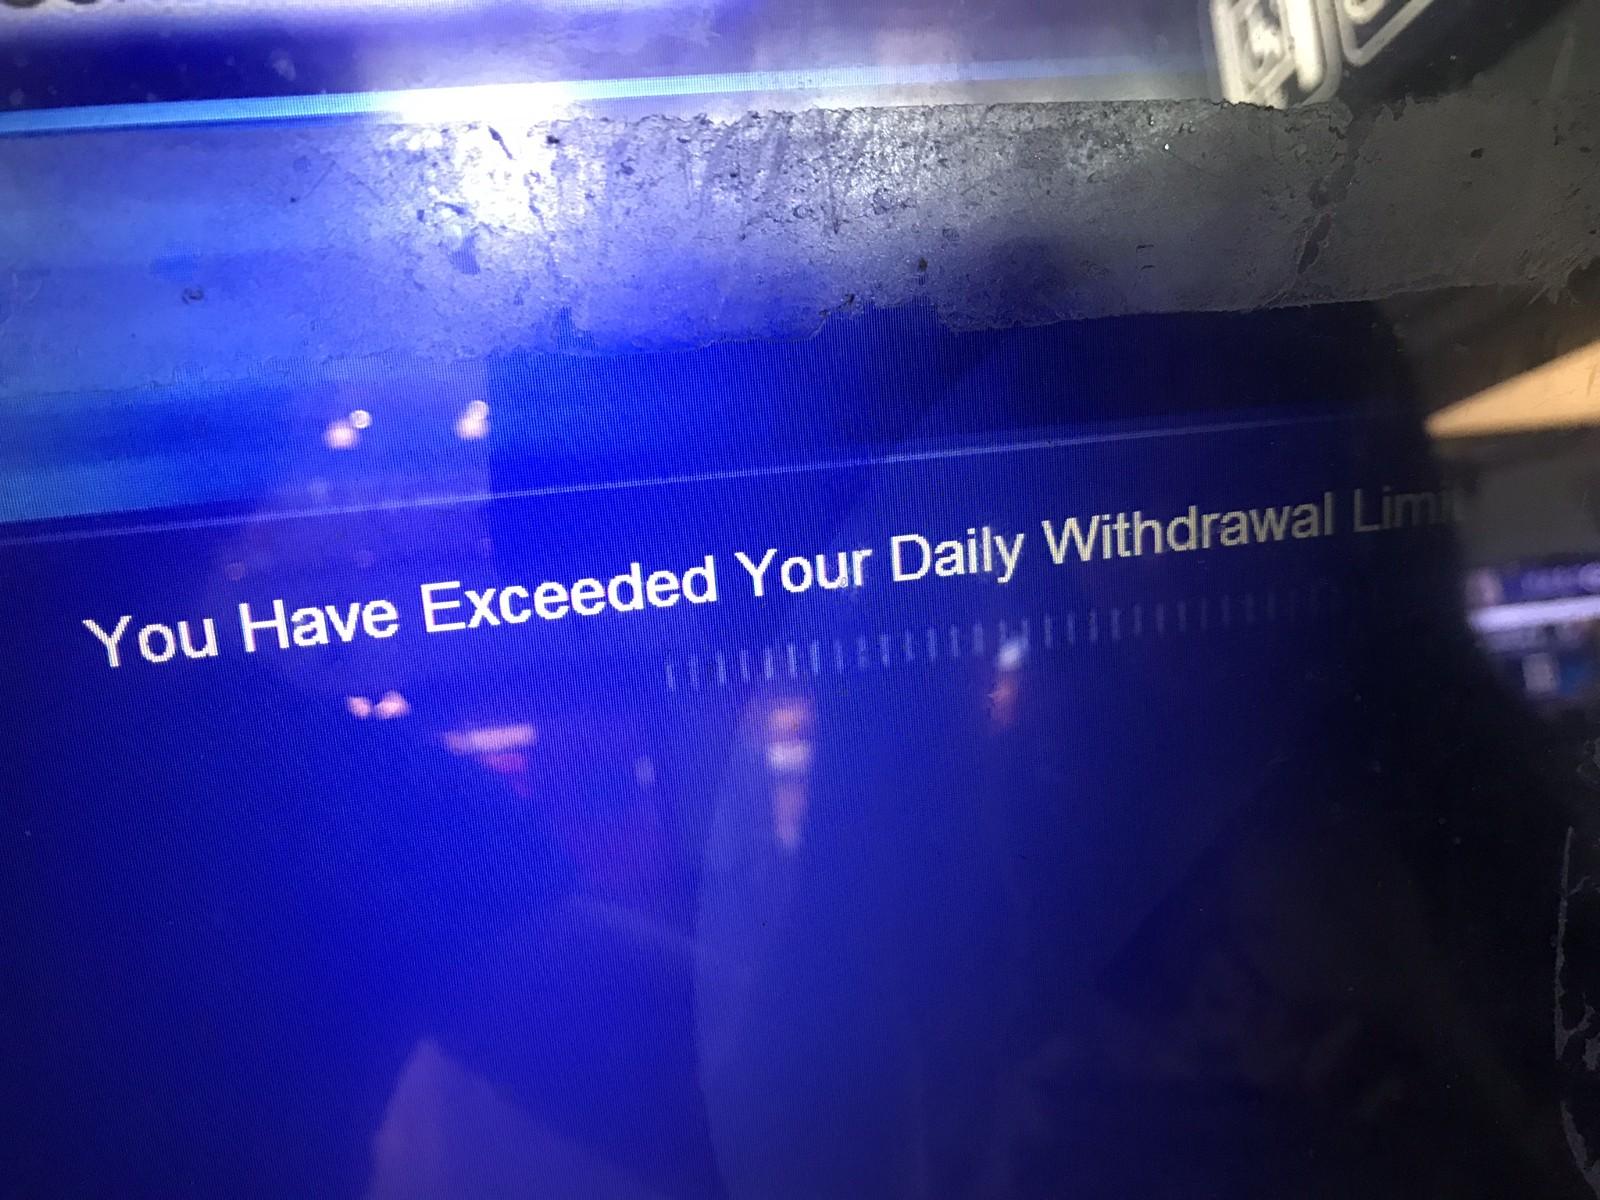 The ATM error.